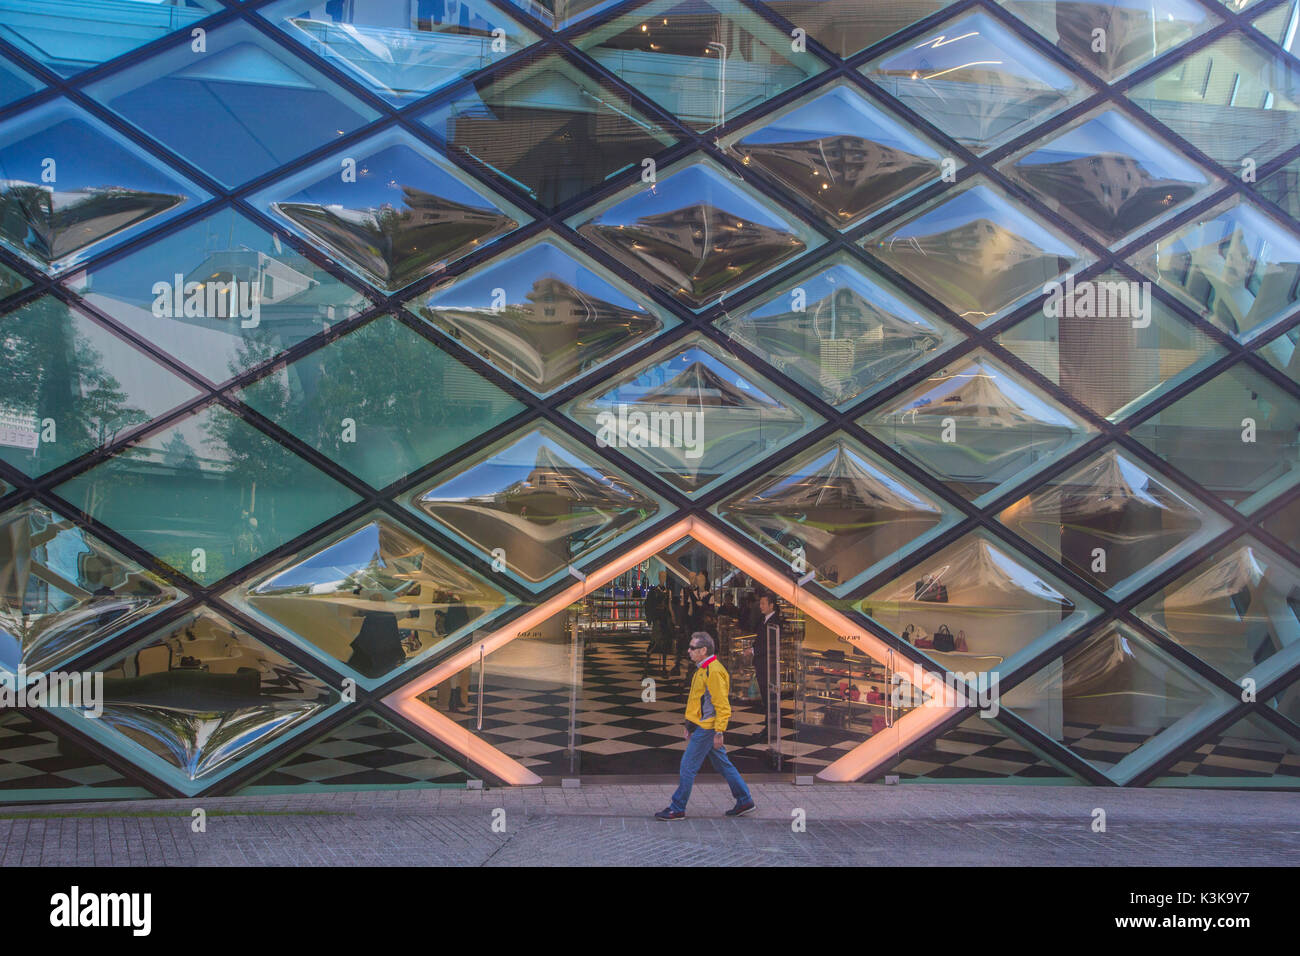 Le Japon, la ville de Tokyo, architecture Zone Omotesando Photo Stock